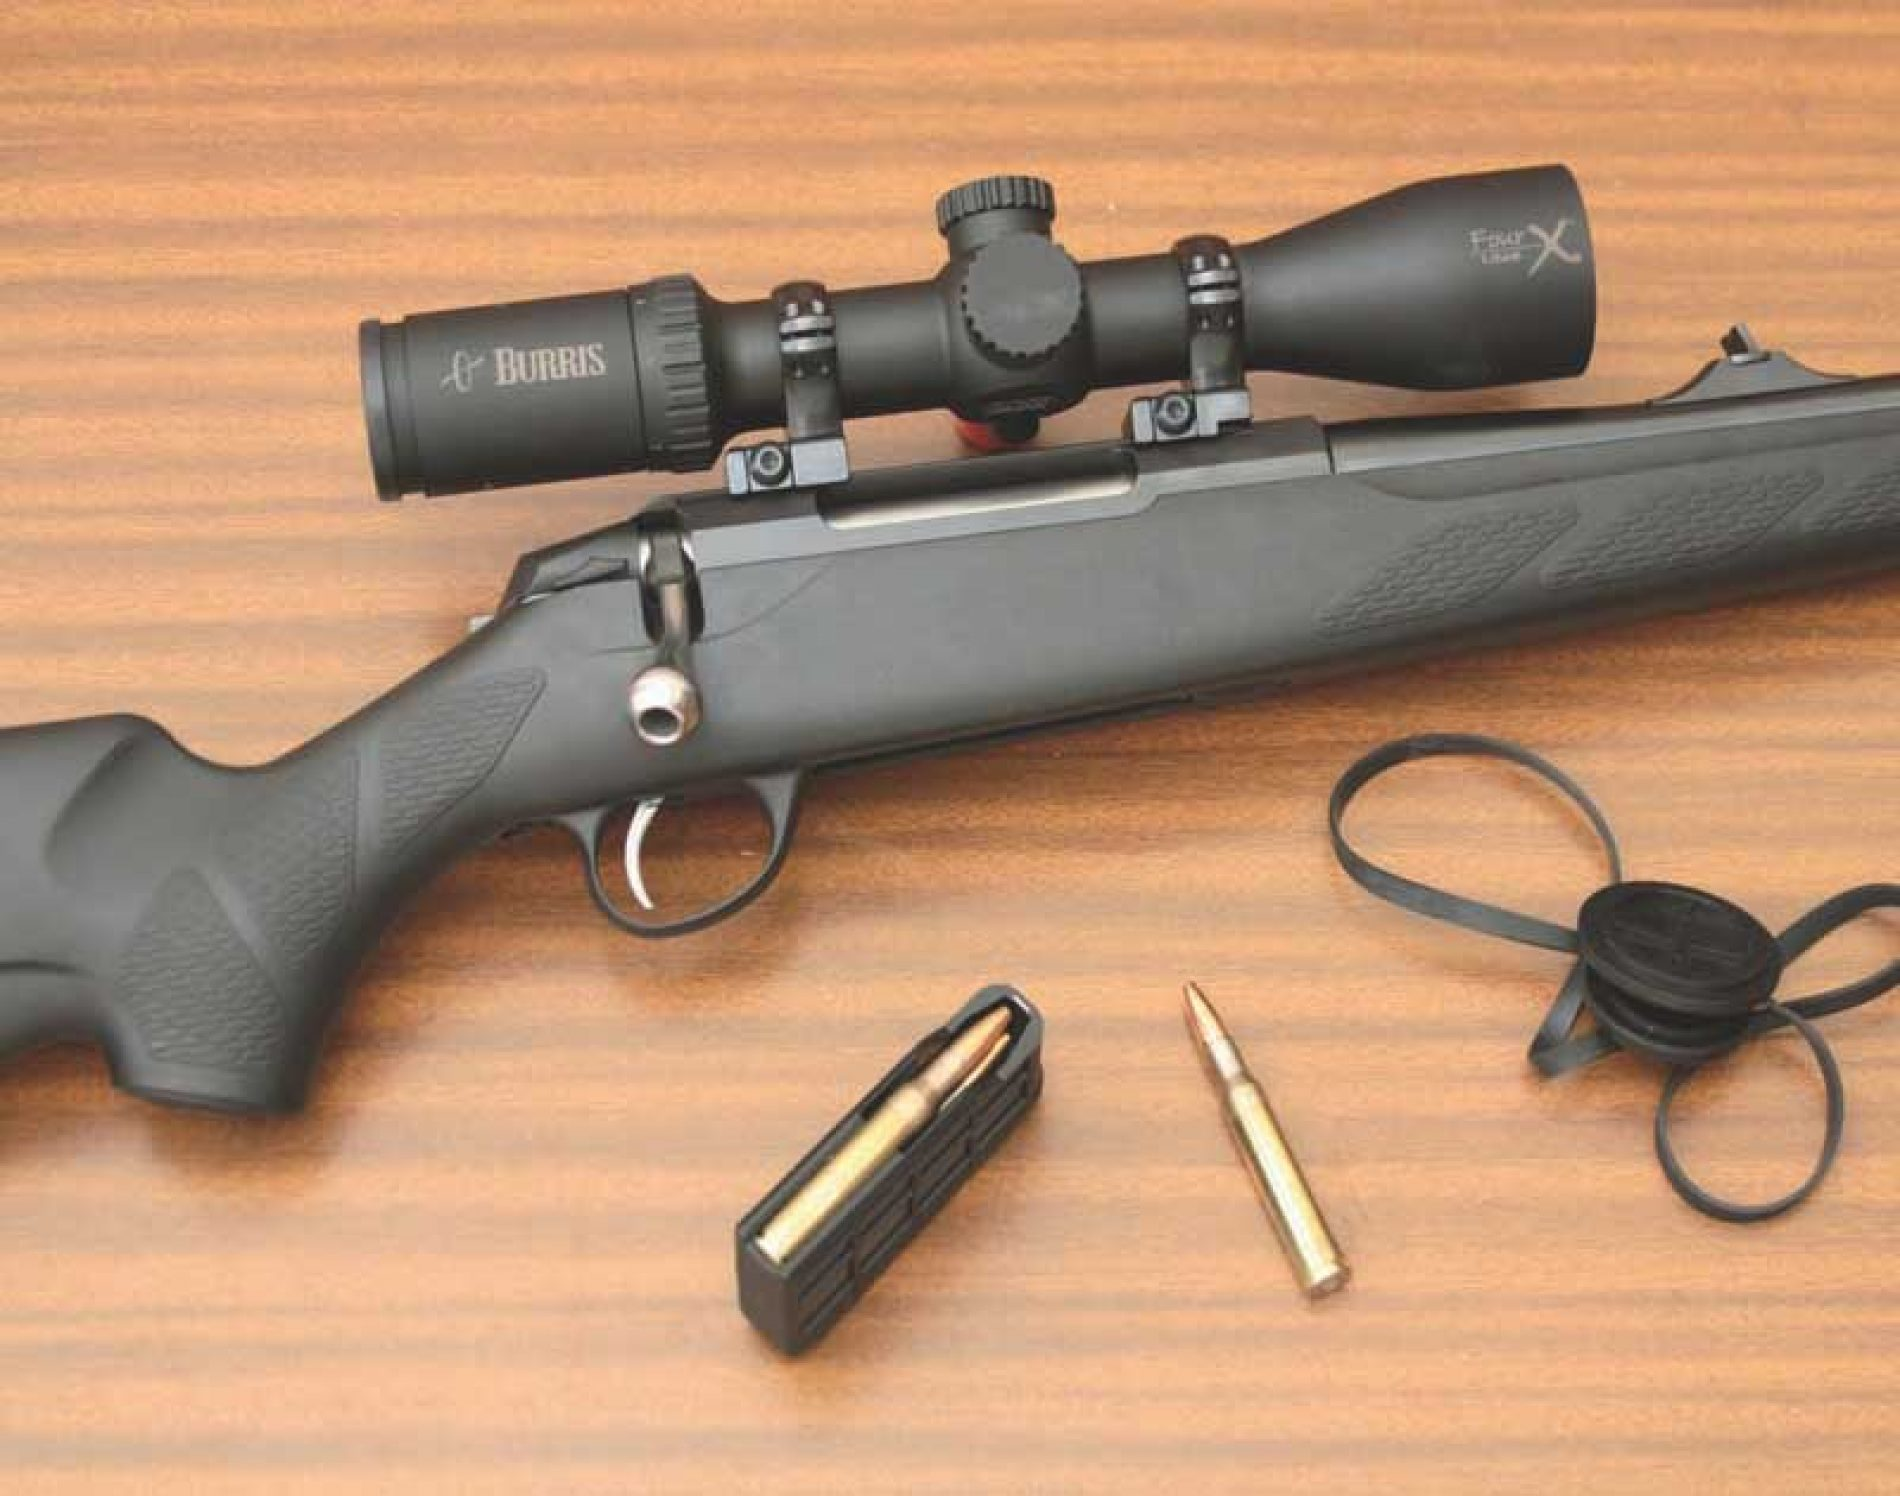 Prueba del rifle Tikka T3 Lite, preciso, robusto y muy ligero